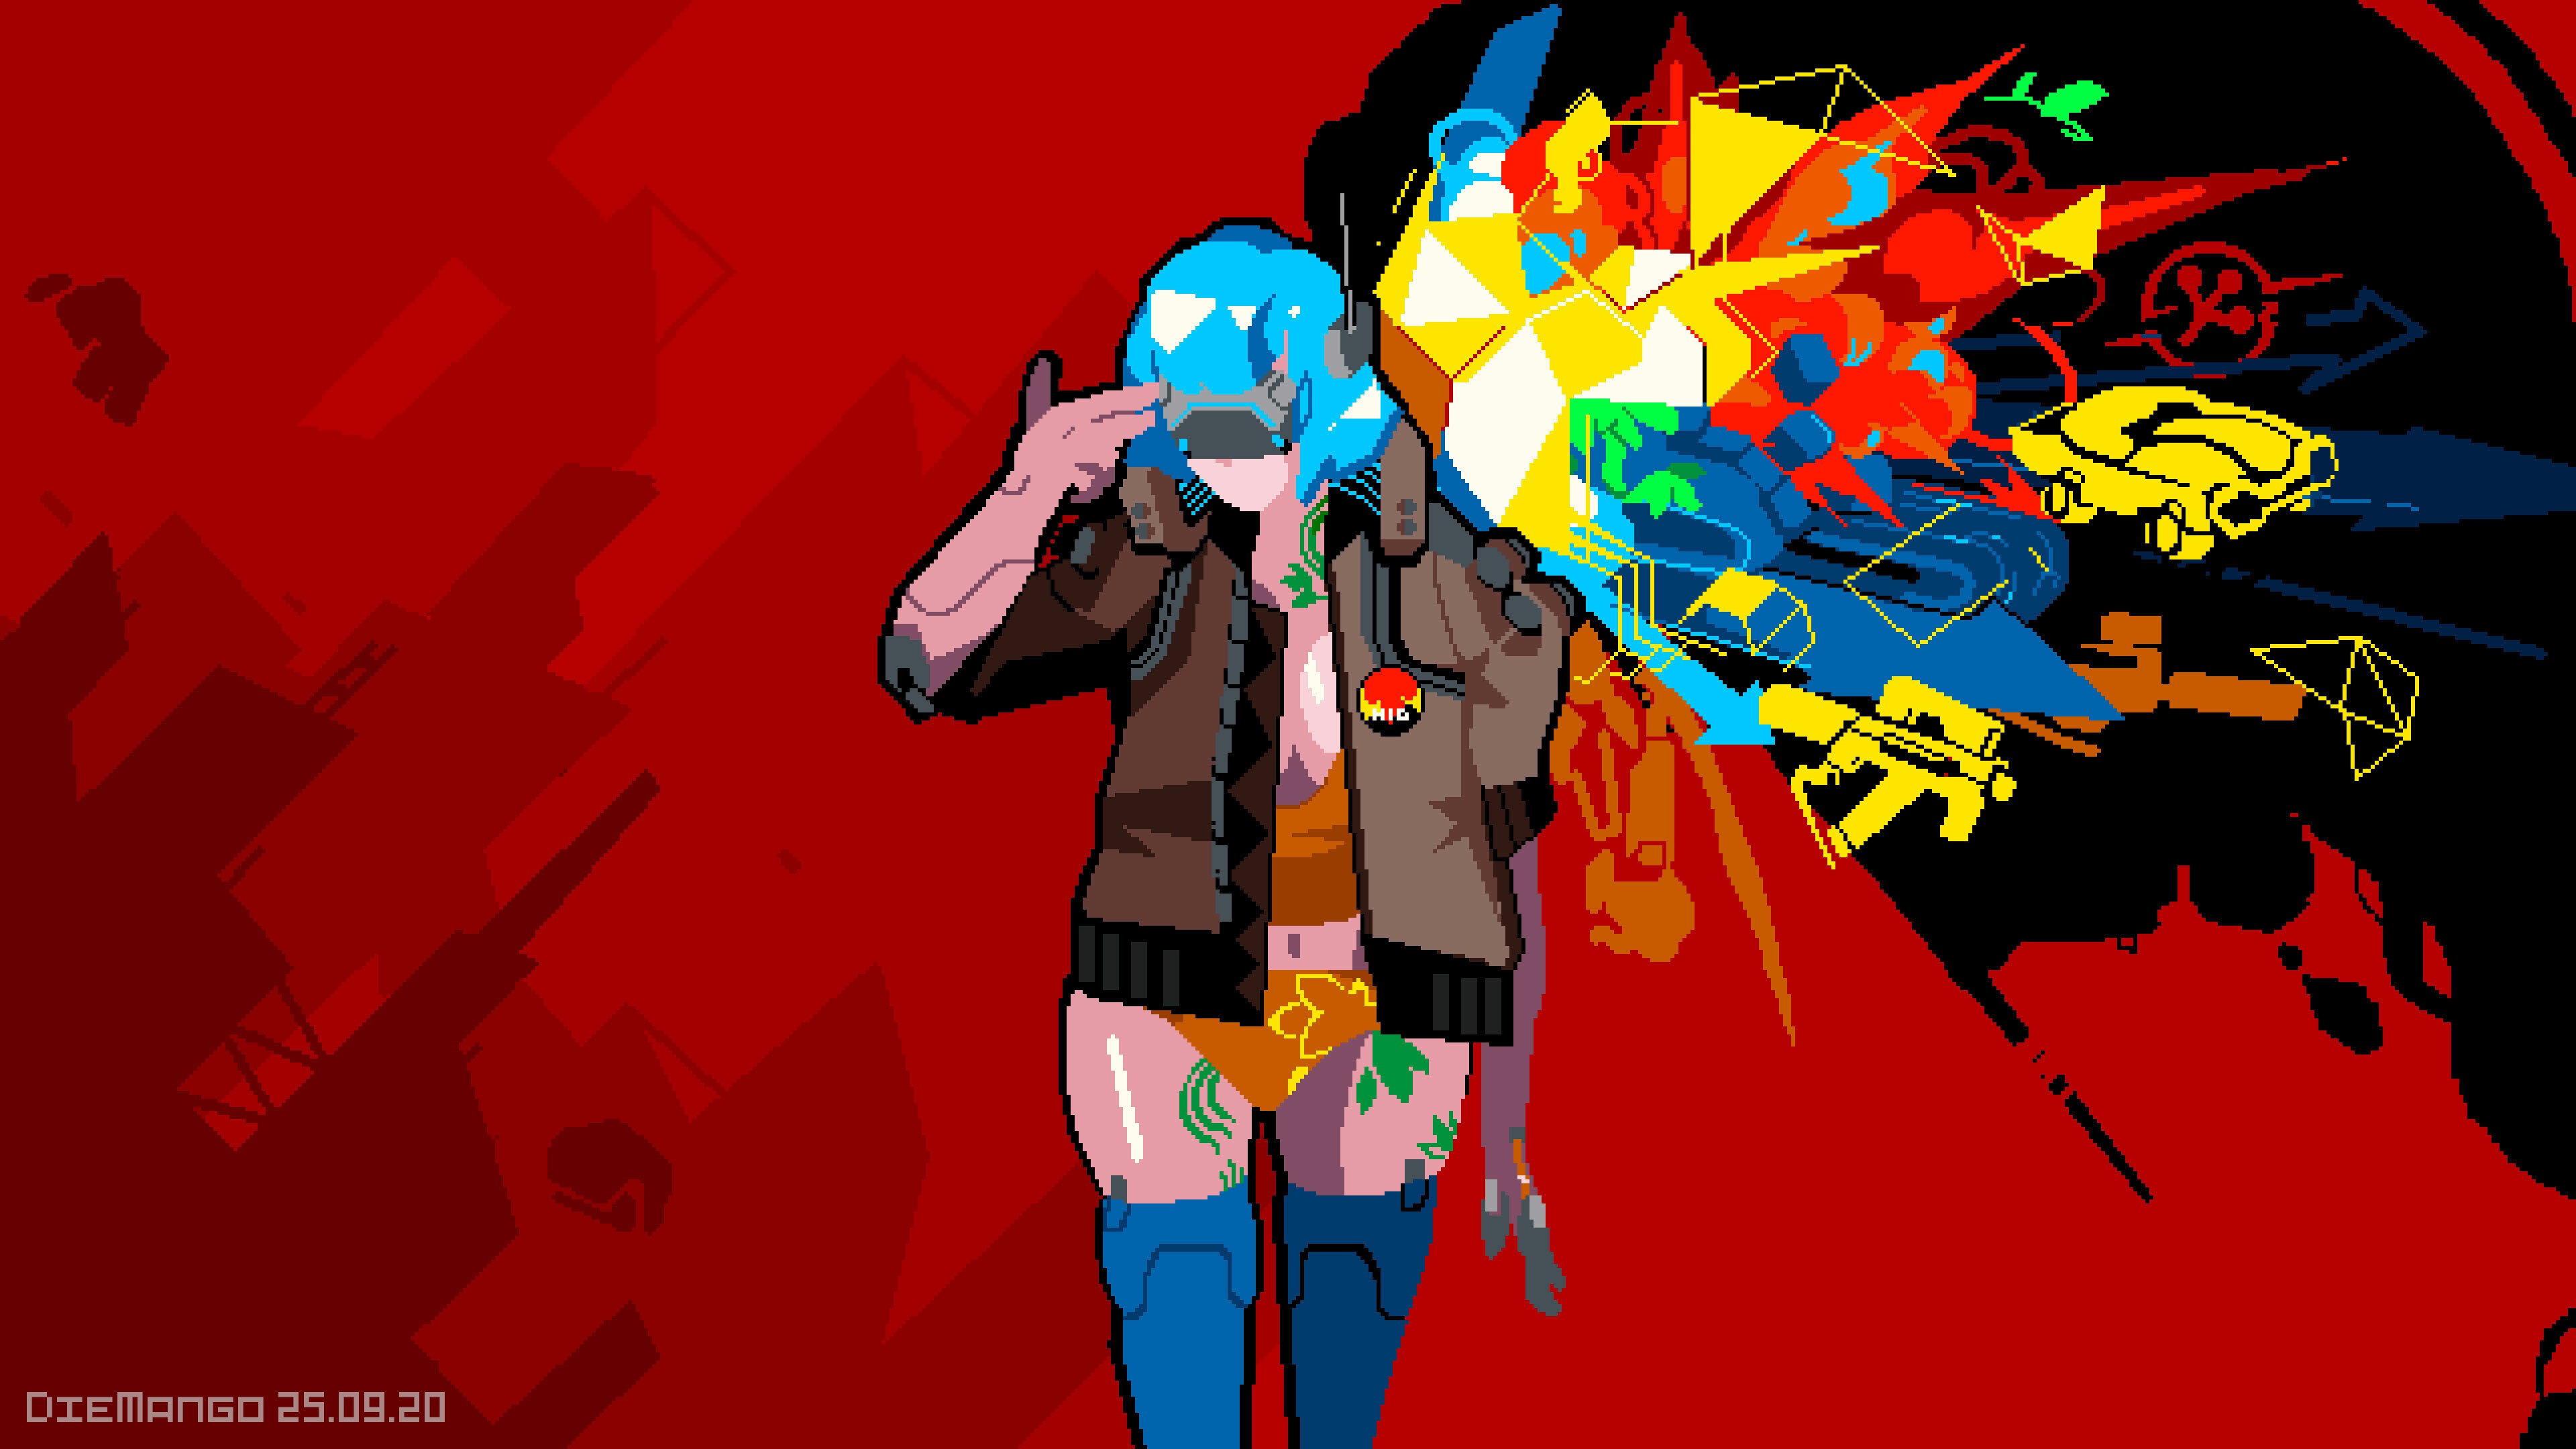 Cyberpunk Artcontest Submission